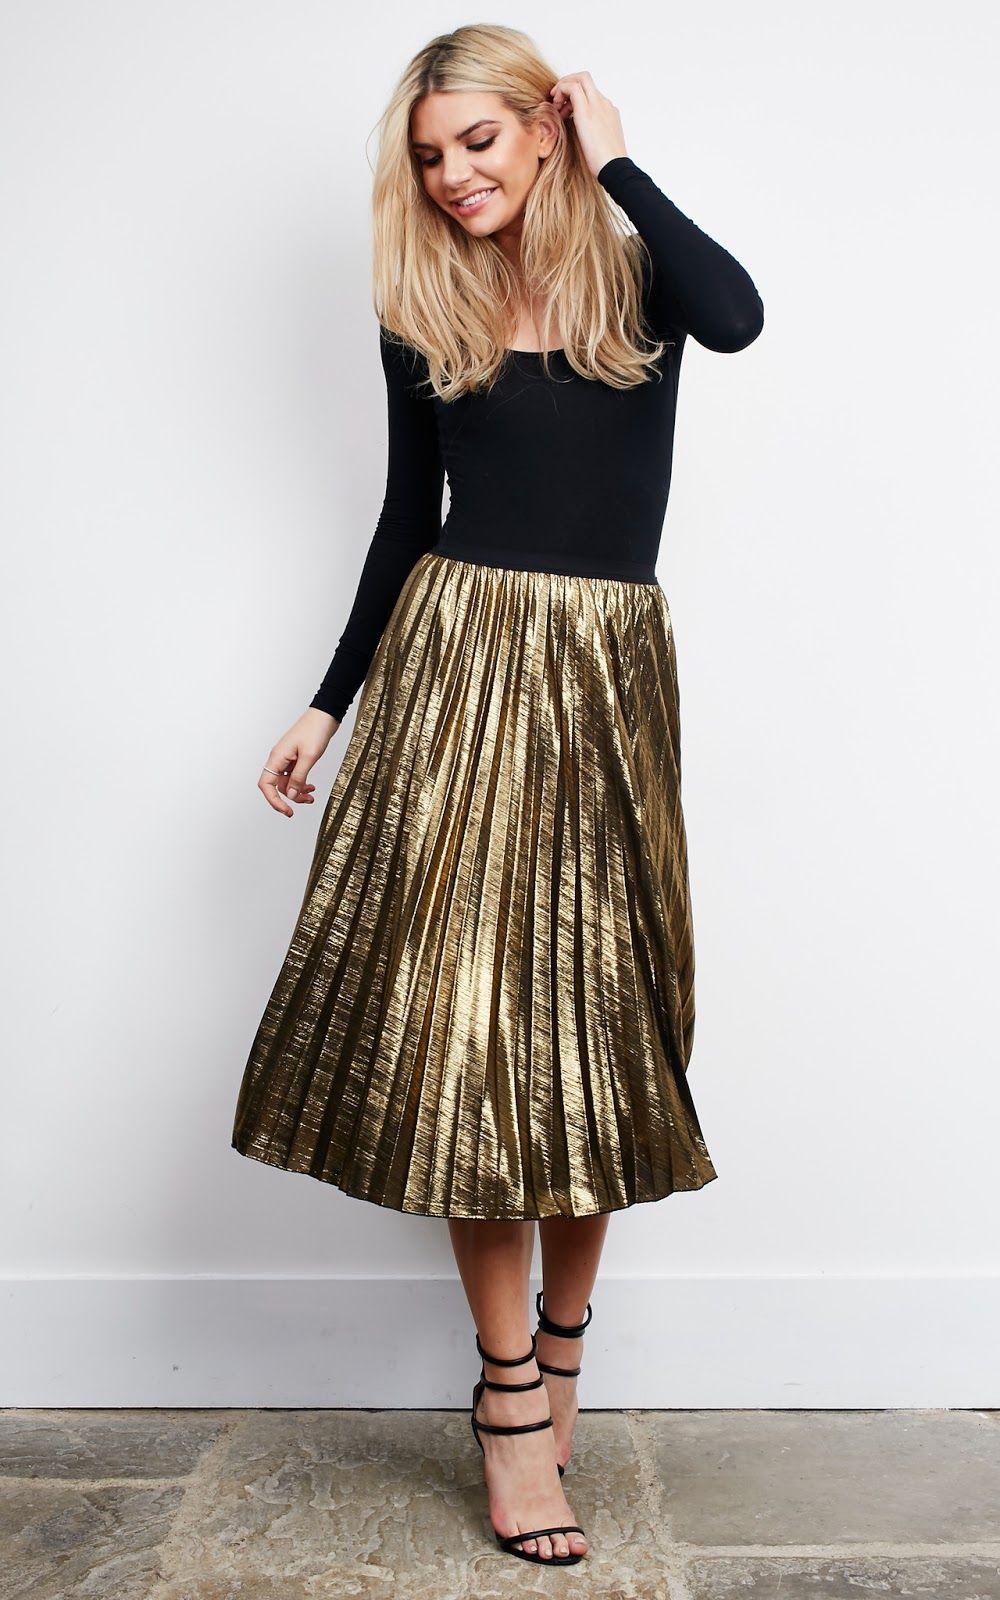 14d4b8513 Bauchle Fashion: Sparks Fly-Oscar Worthy Traje Com Saia Dourada, Saia  Plissada,